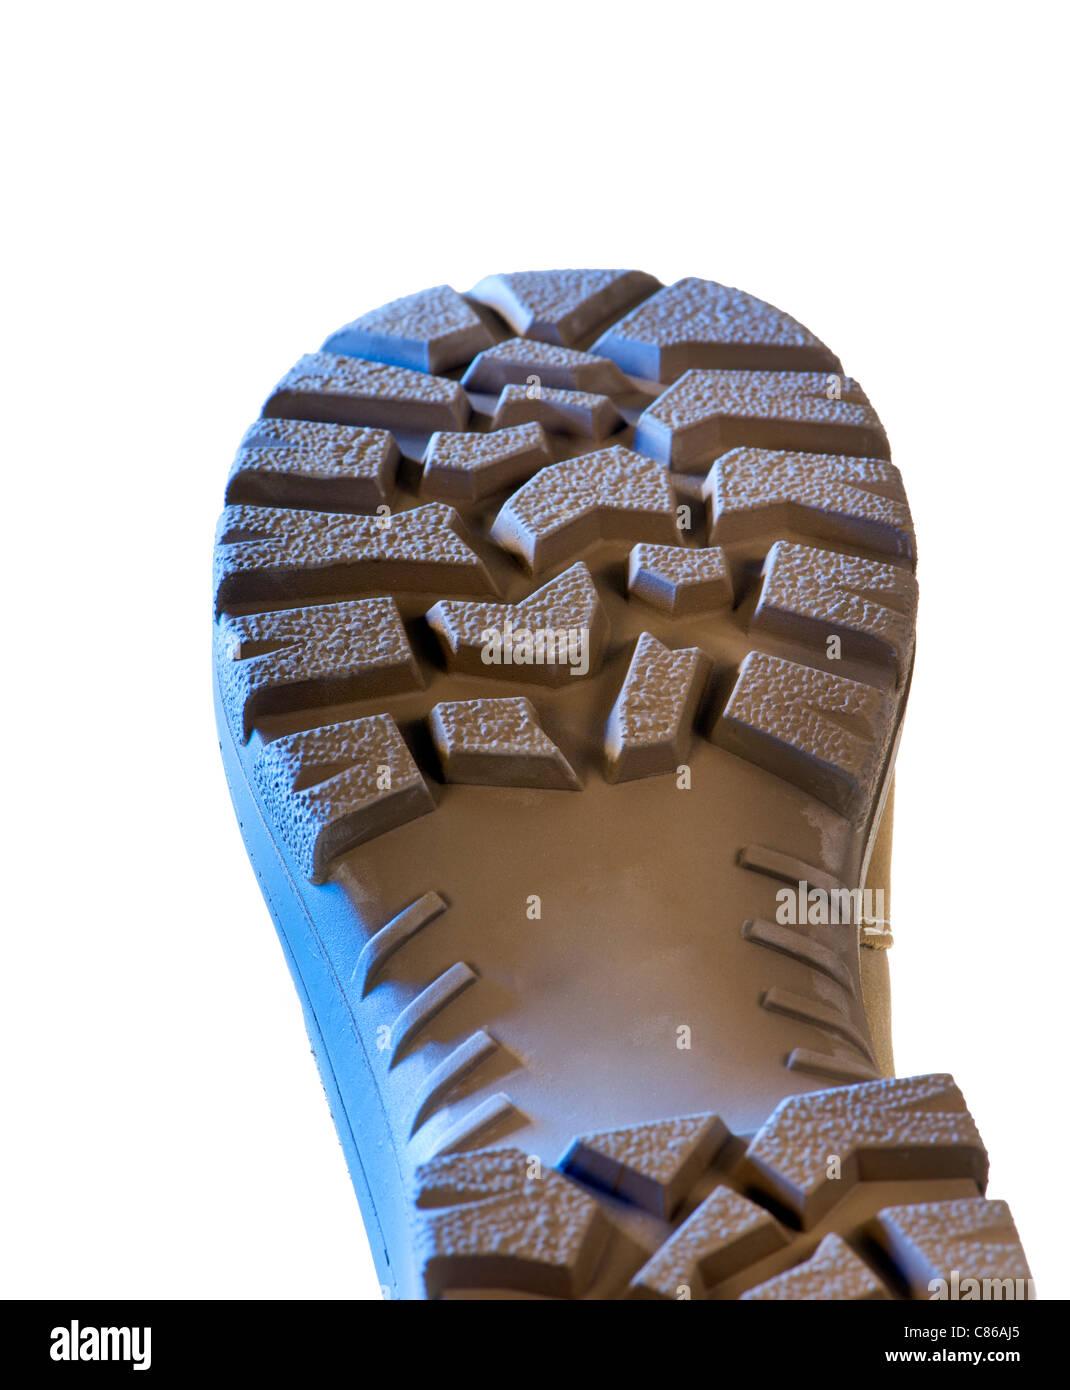 SHOE new close up close-up black shoe shoerepair repair sole size shoemaker maker shining shine glossy patent leather - Stock Image